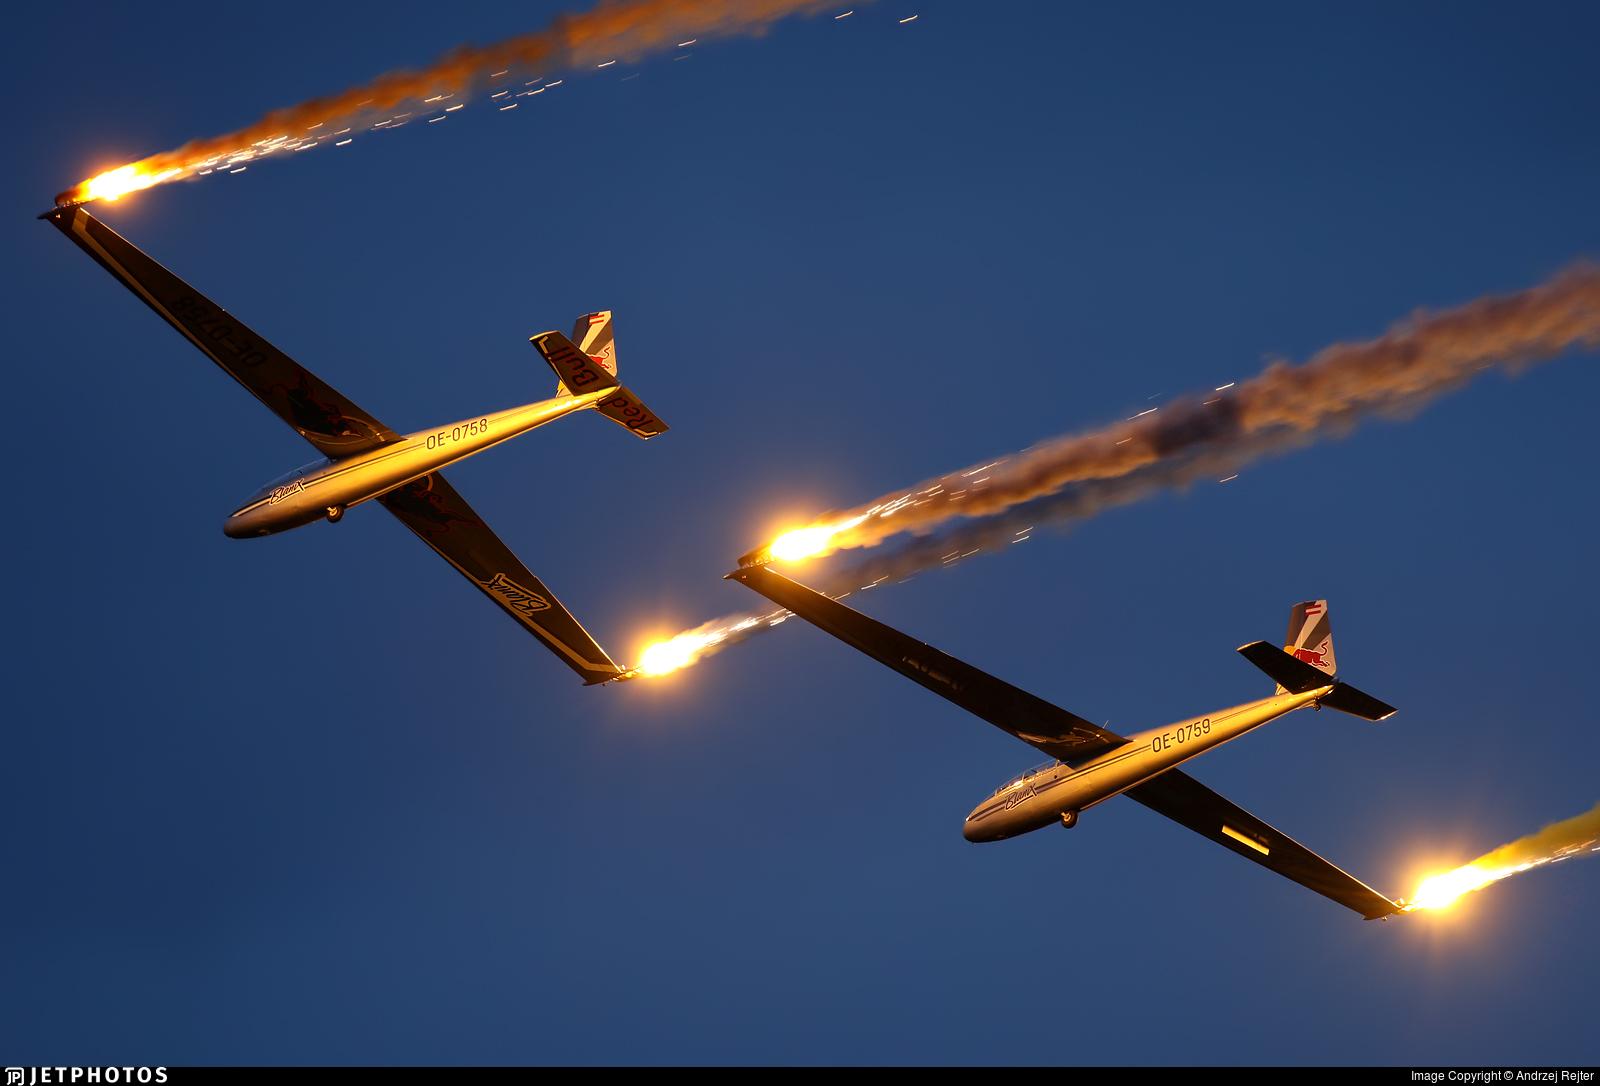 OE-0758 - Let L-13 Blanik - Blanix-Team